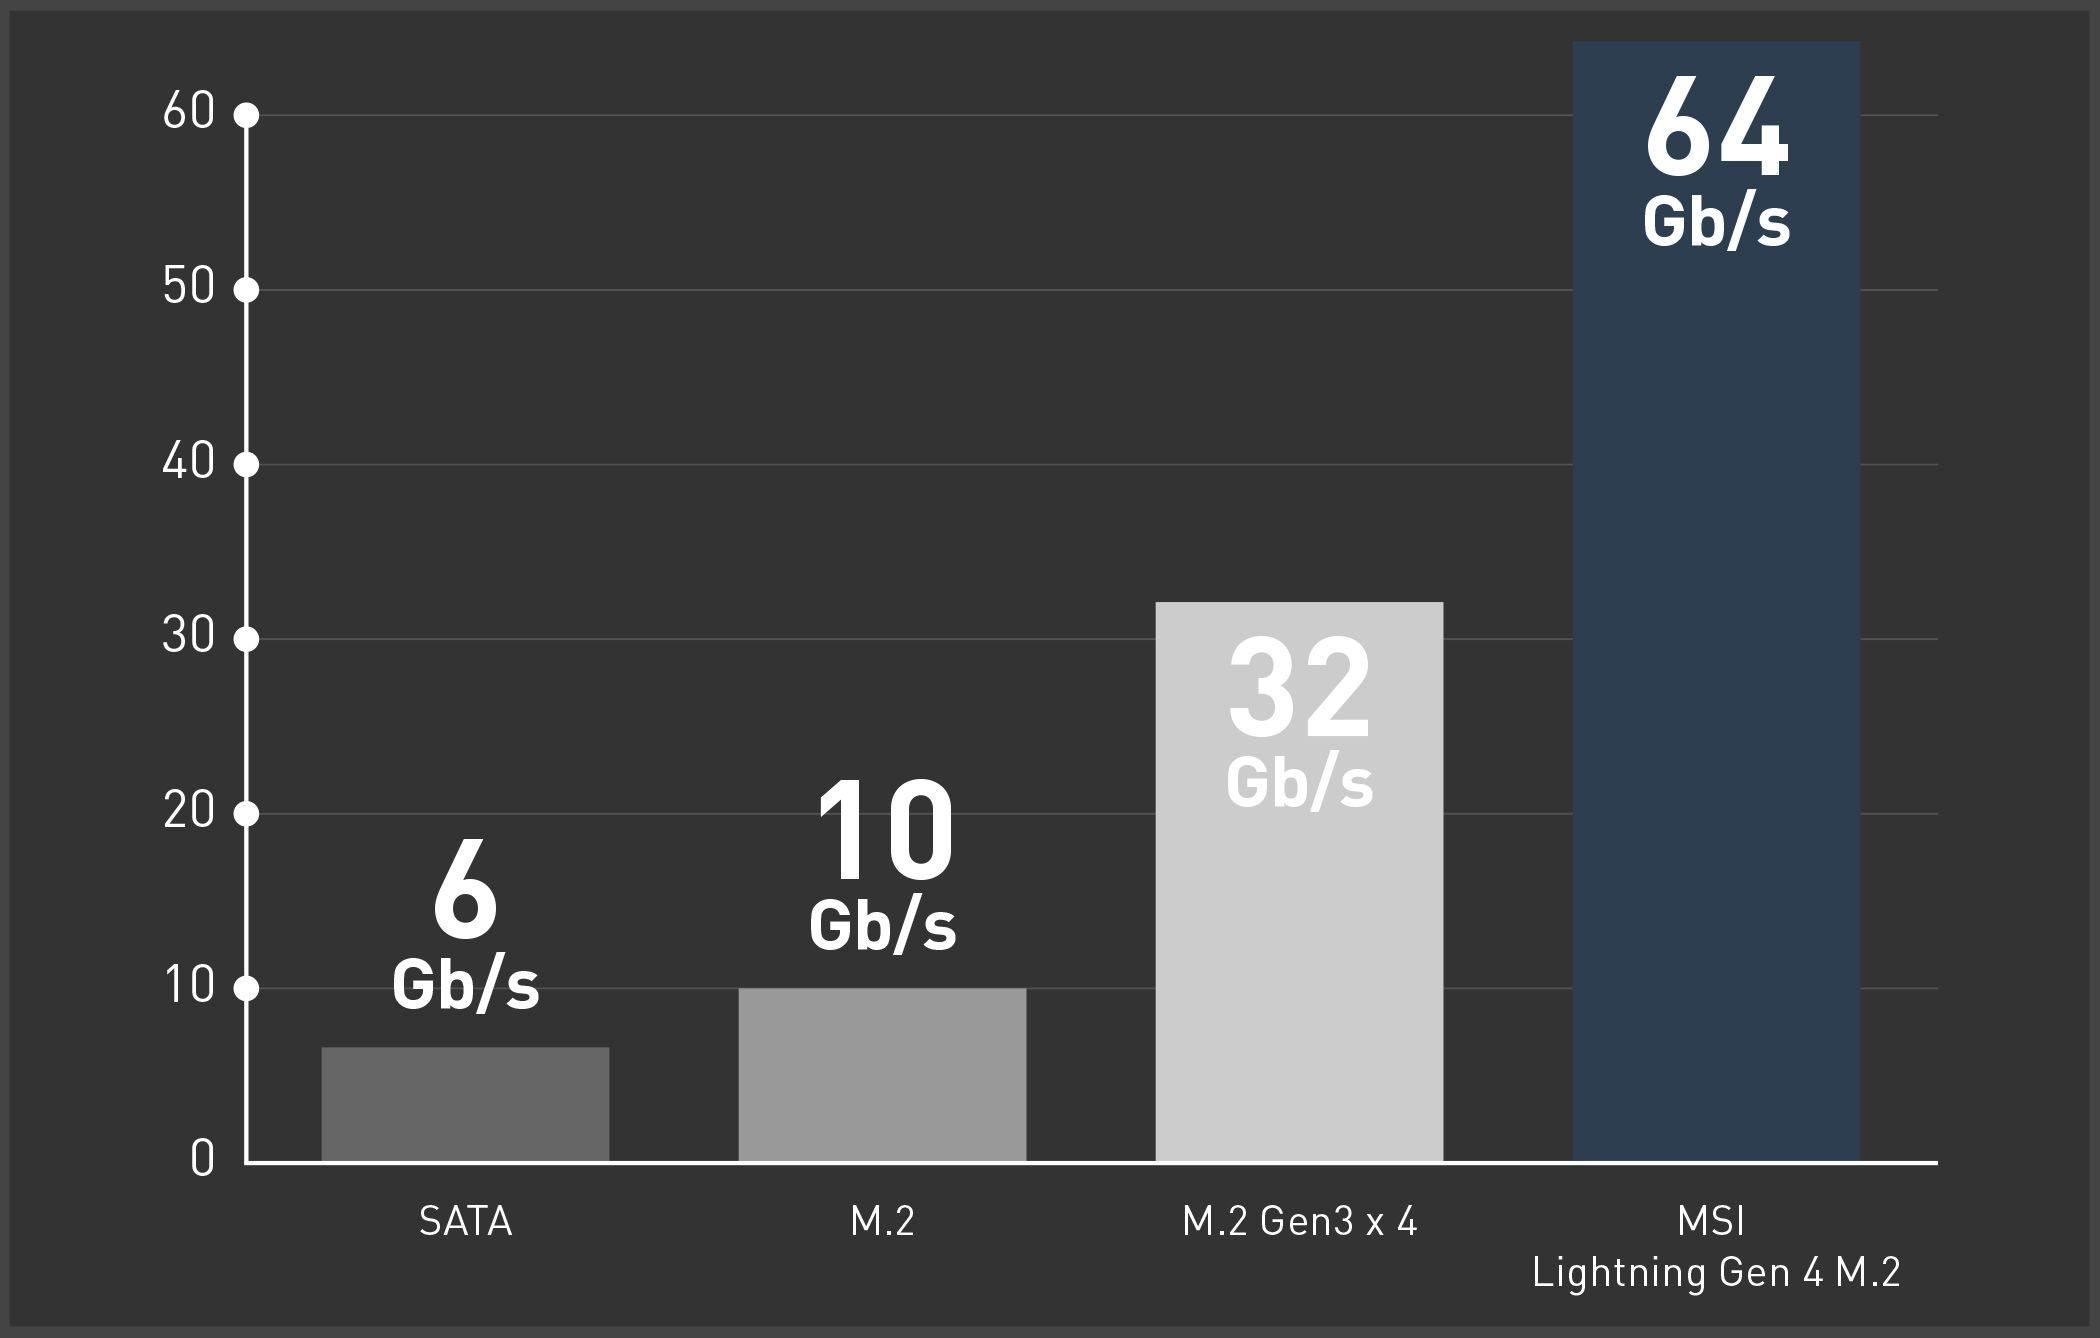 MSI X570 LIGHTNING GEN 4 M.2 CHART